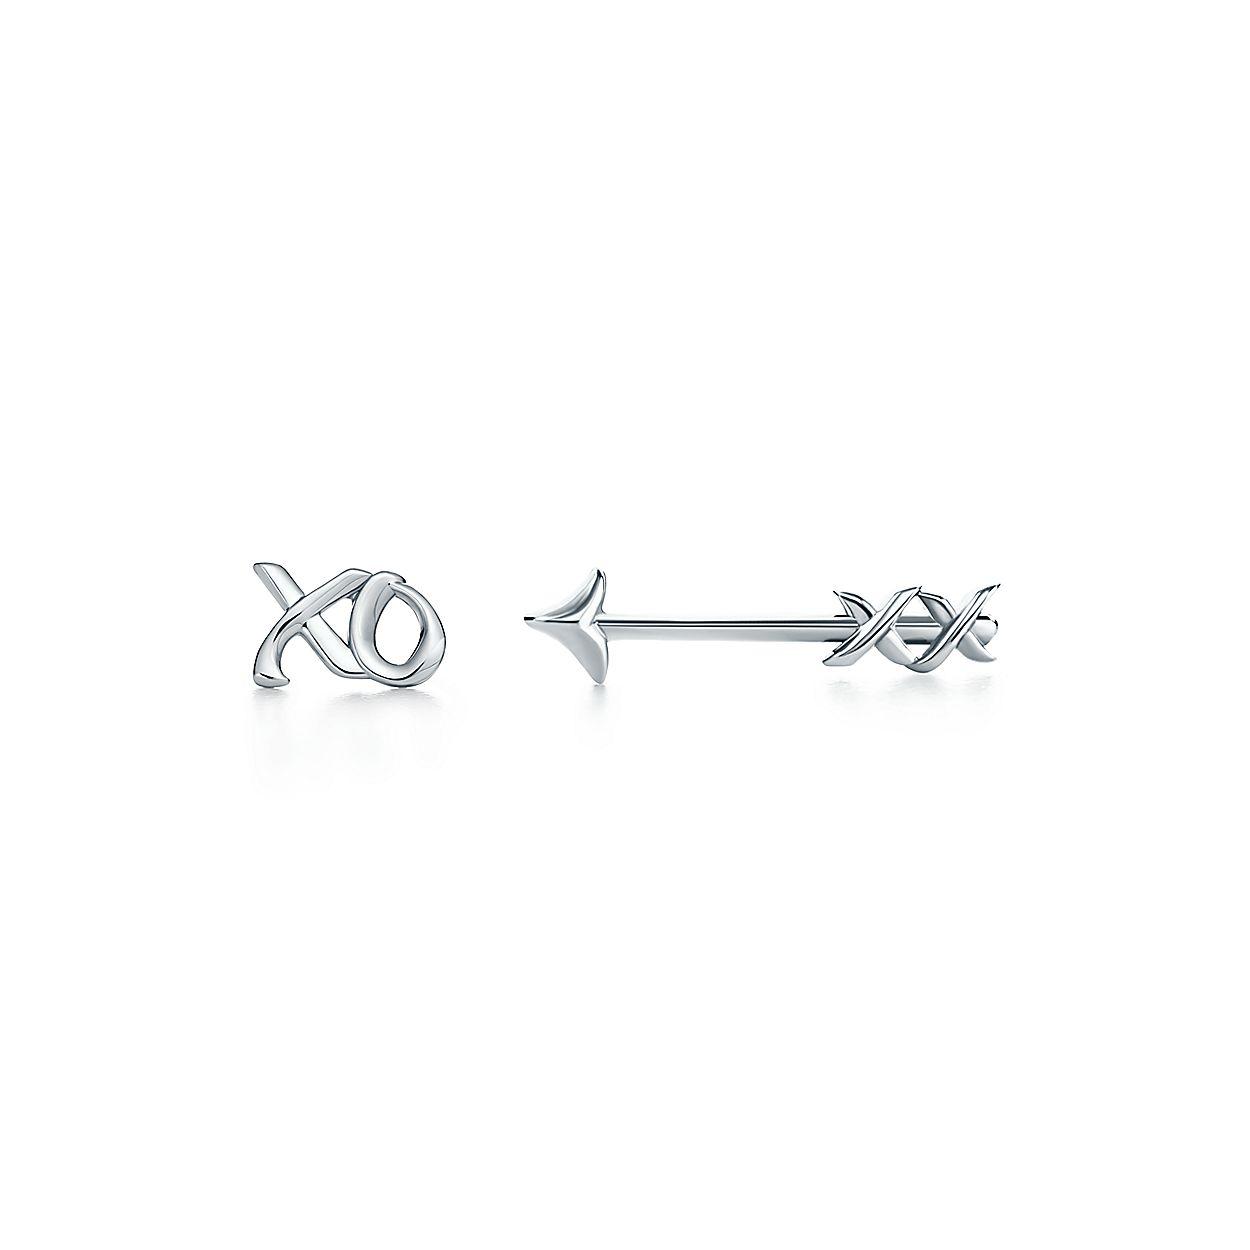 Palomas graffitilove kisses single earring